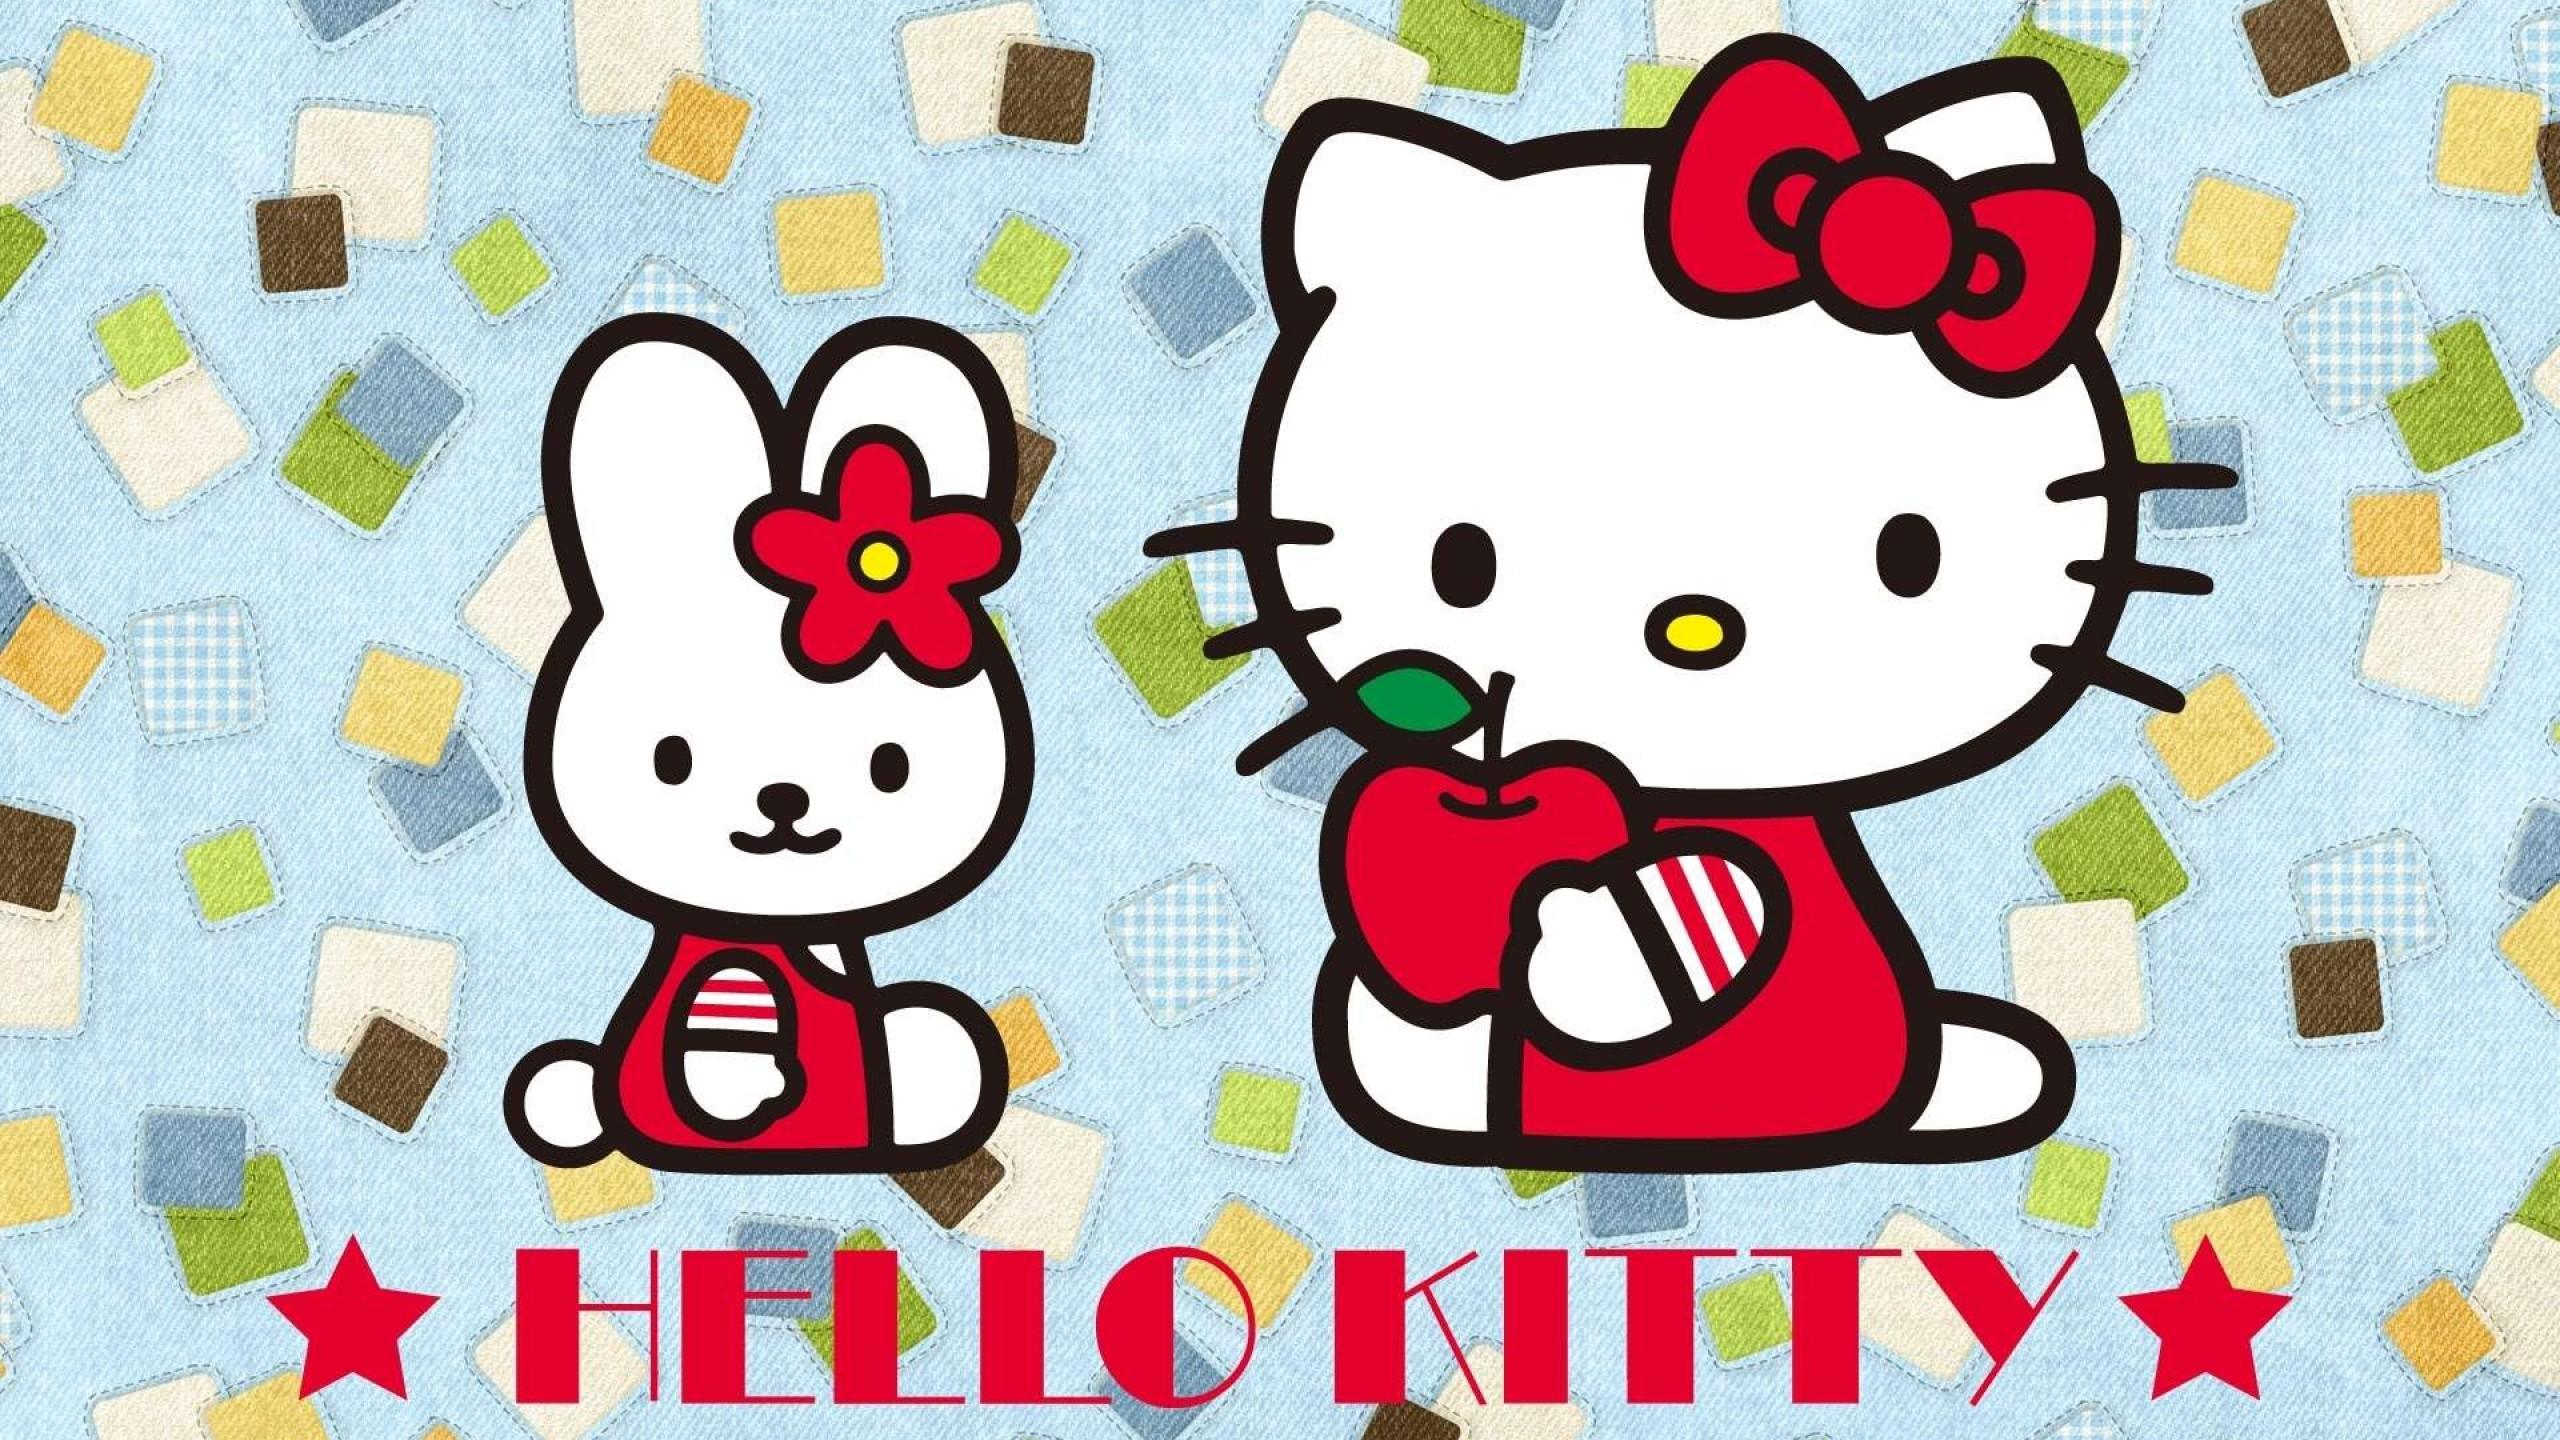 Top Wallpaper High Resolution Hello Kitty - jMXhPs  Pictures_419392.jpg